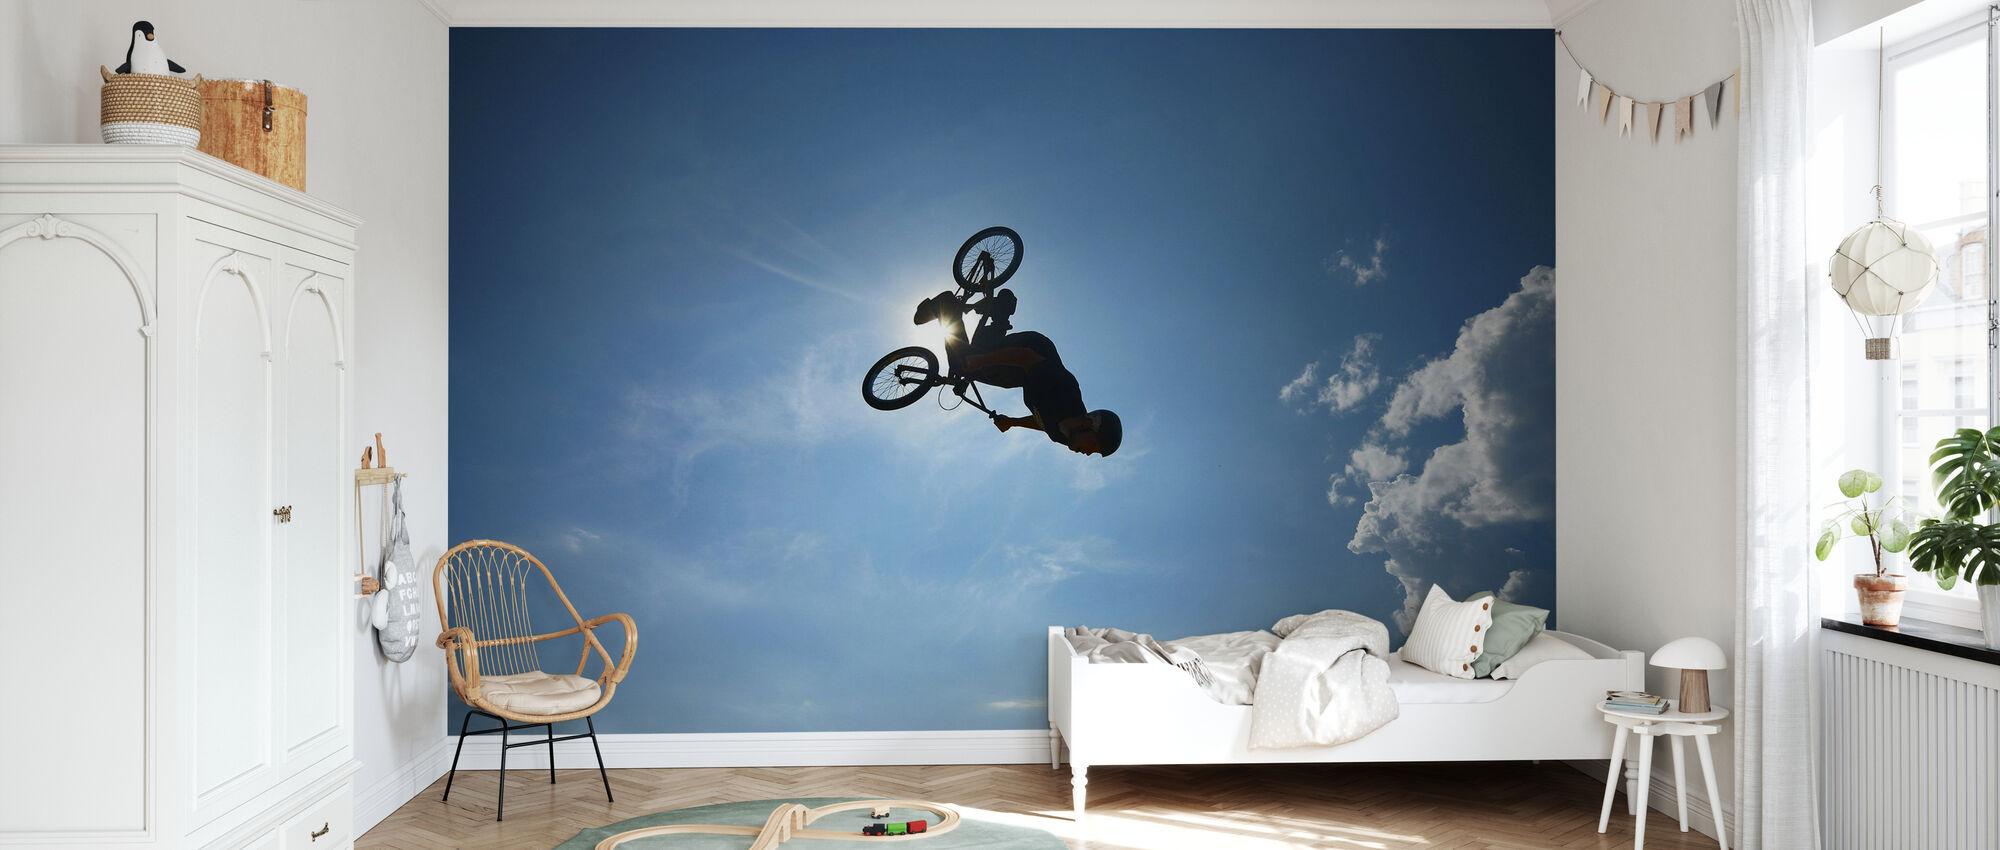 BMX Backflip - Behang - Kinderkamer